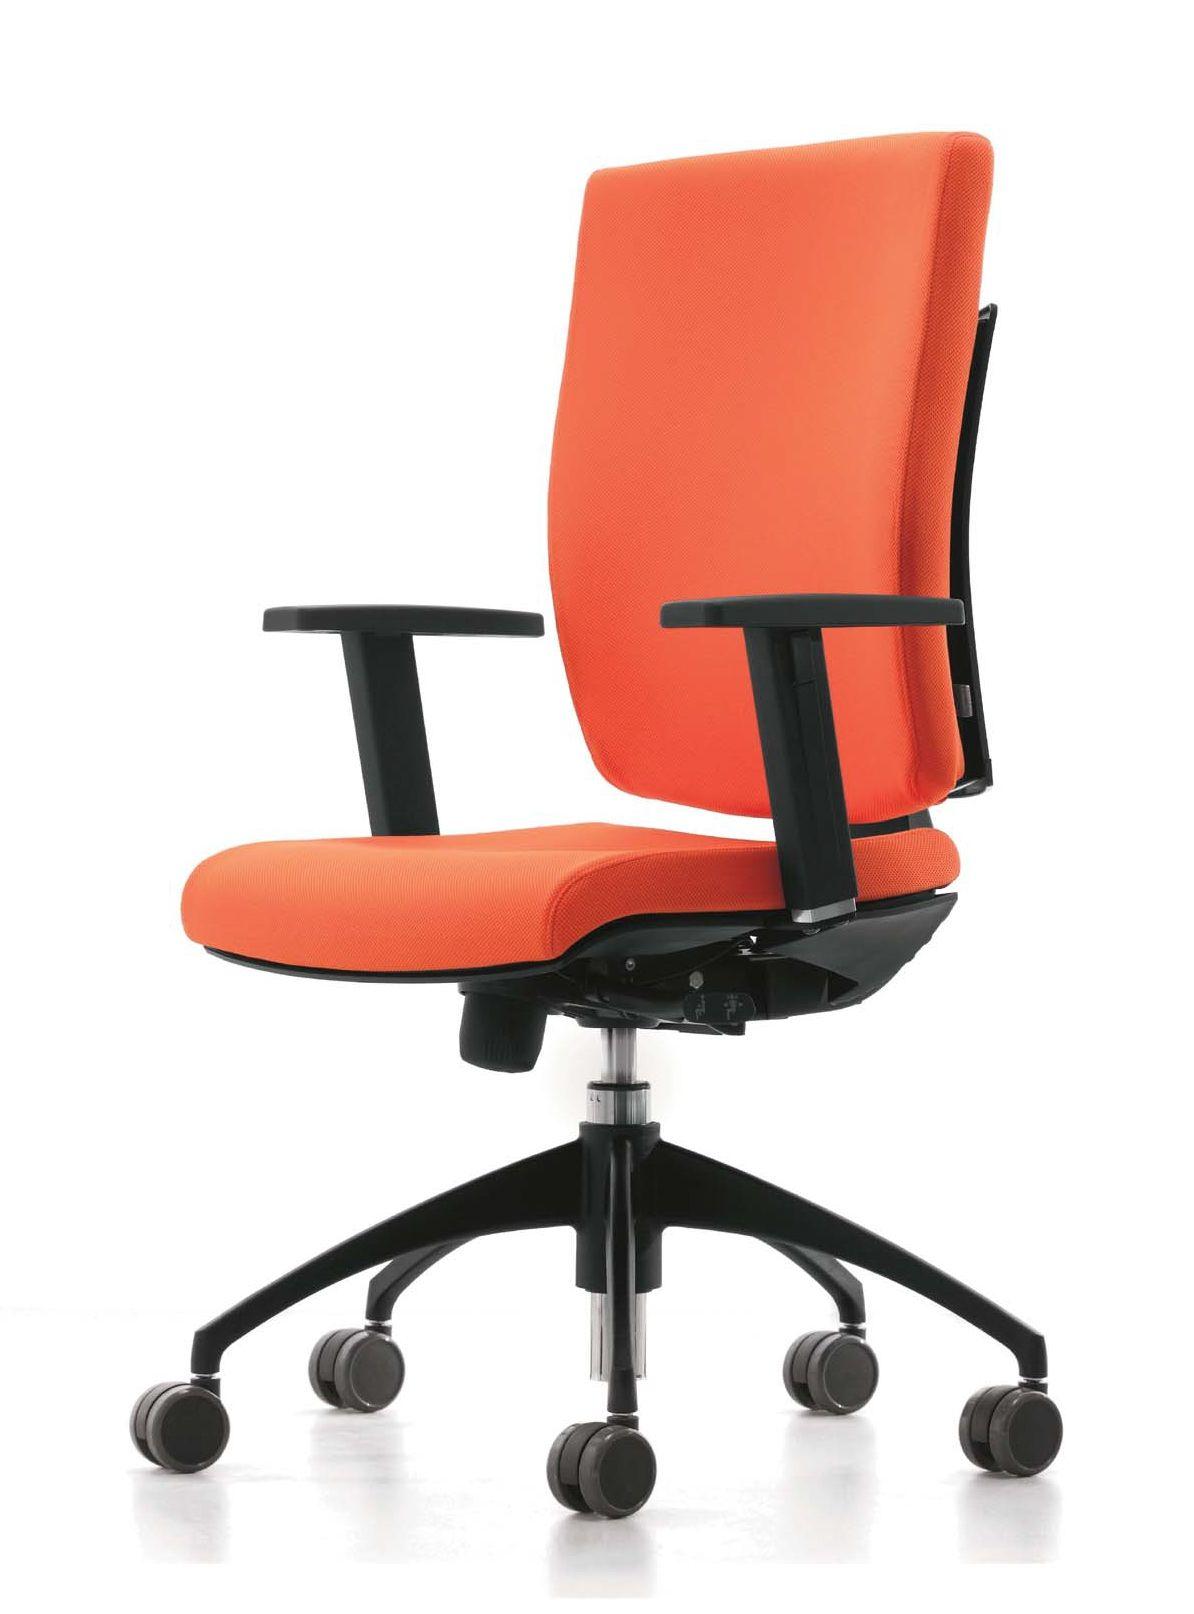 UPPER PANAMA presenta PIXEL Silla operativa ideal para oficina